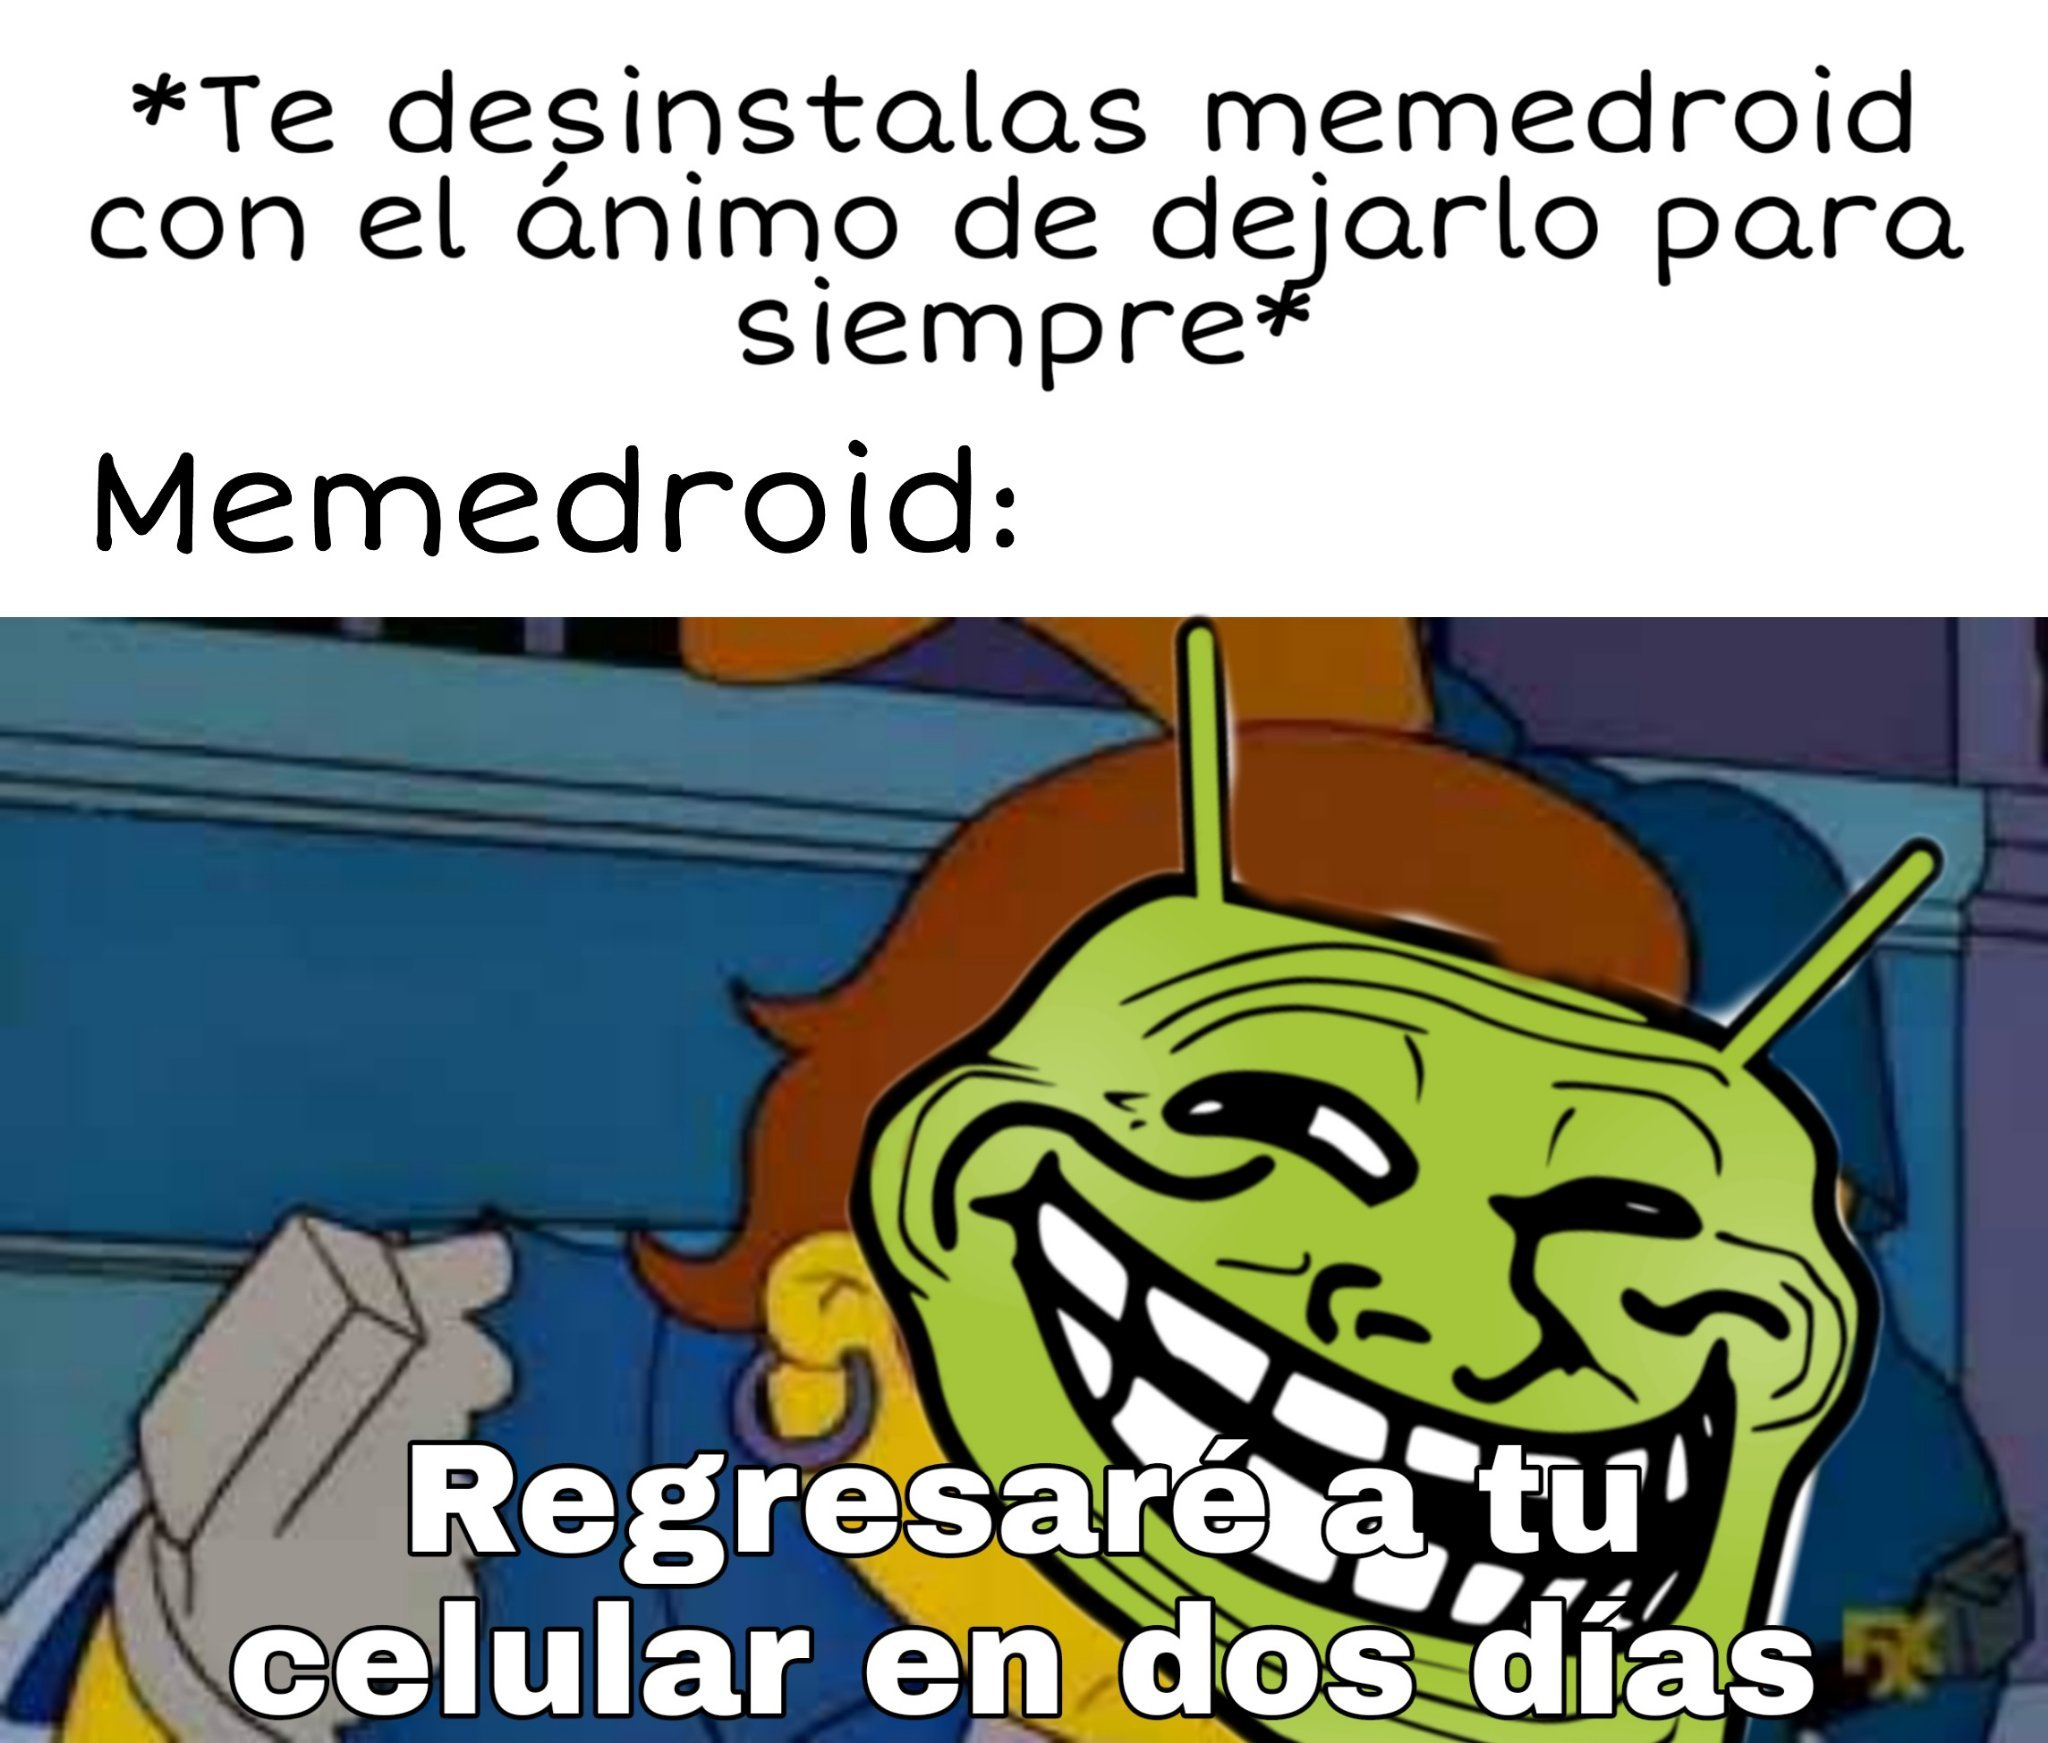 La wea adictiva - meme